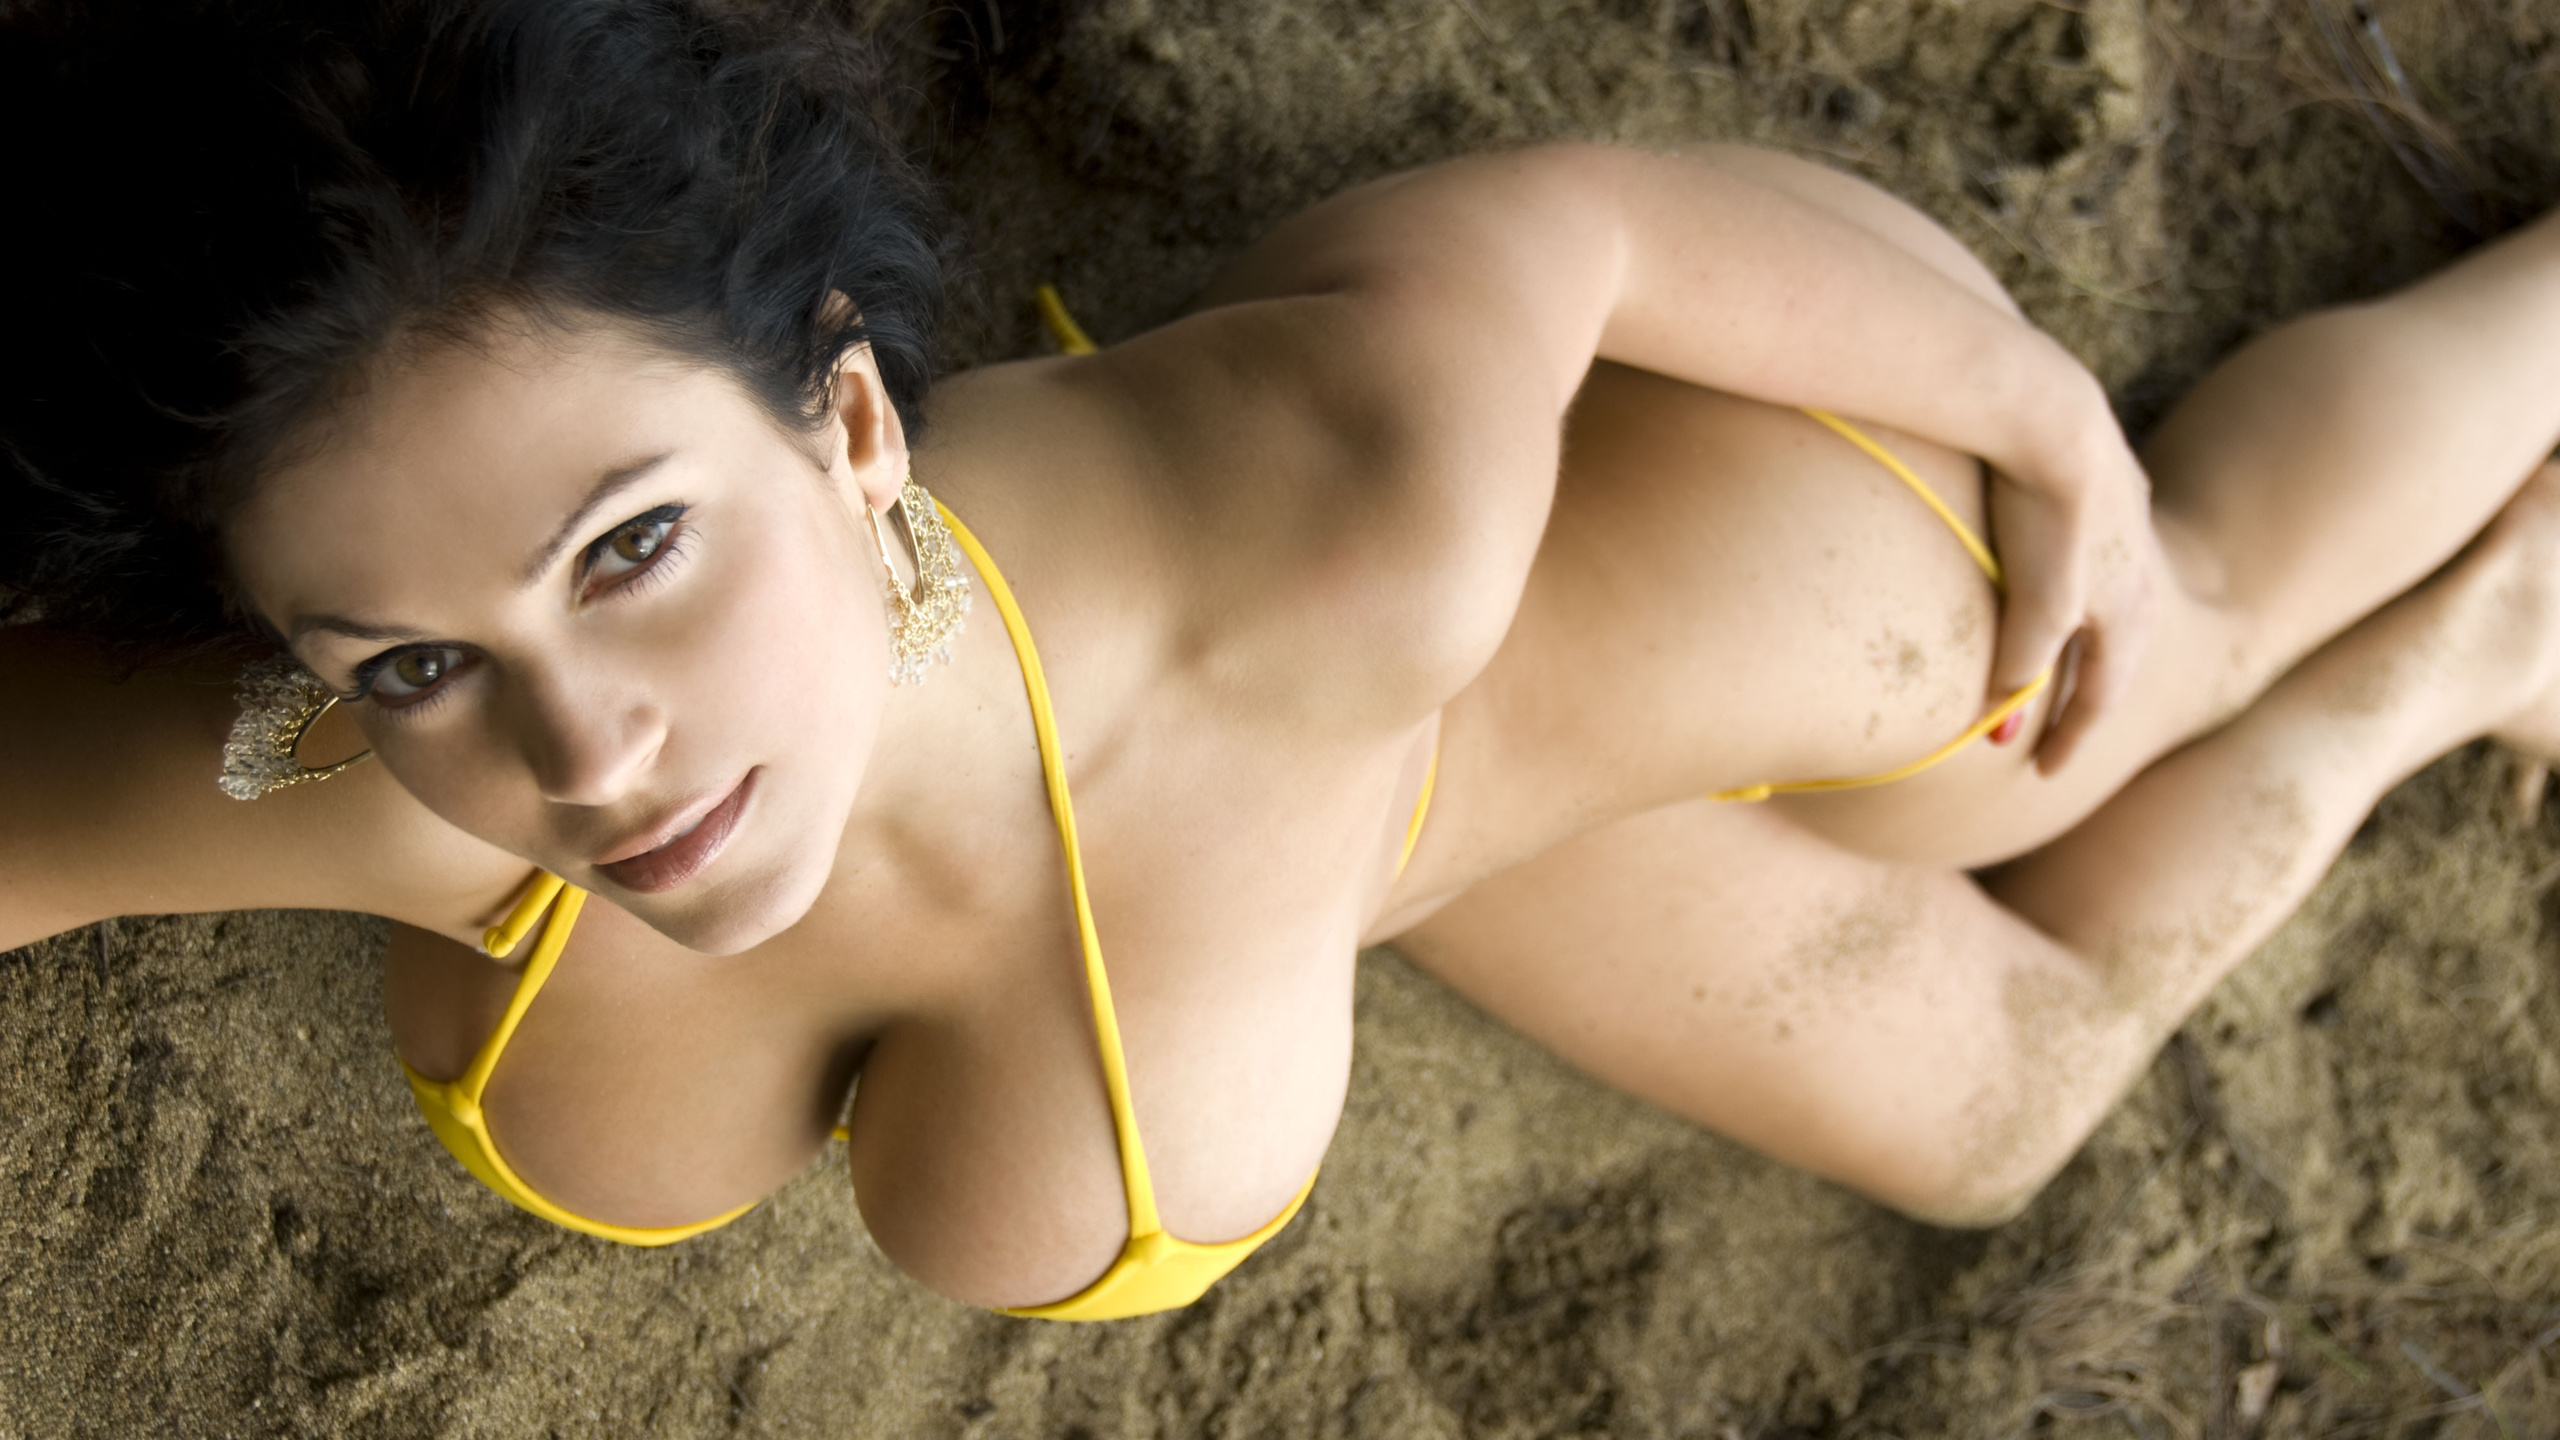 Image denise milani ass buttocks naked sexy sleepwear female high